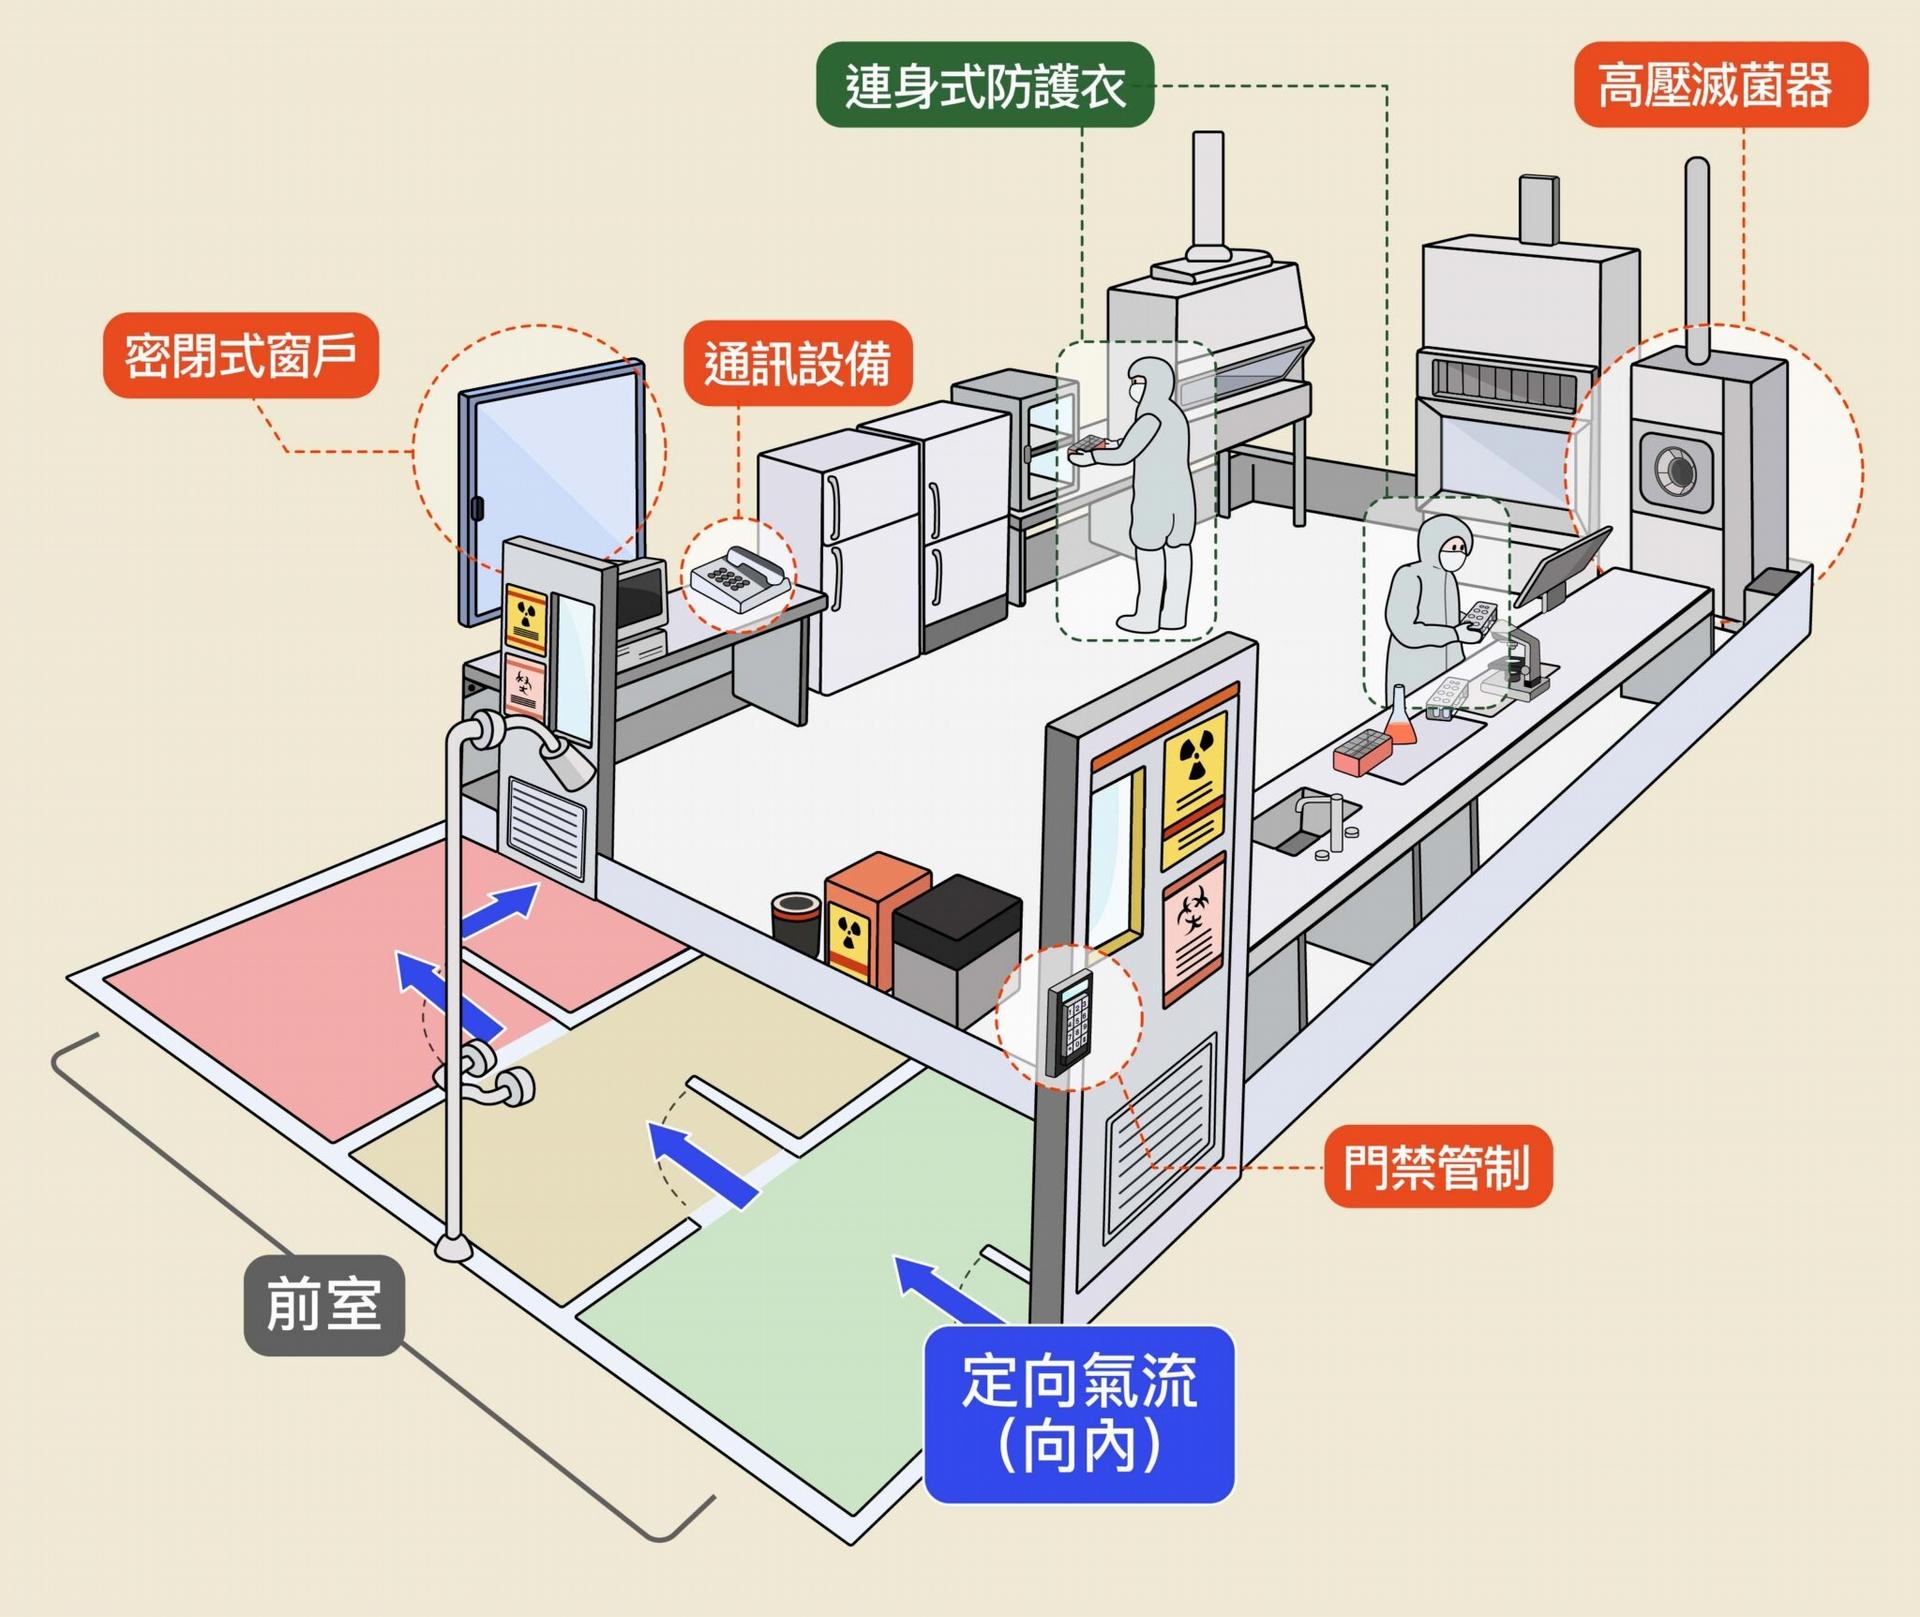 P3、P4 實驗室特點是內部的負壓呈梯度分布,愈往裡面壓力愈低 ,以防止氣流外洩。此外,實驗室必須具備高壓滅菌鍋,實驗用品必須經過高溫高壓、蒸氣滅菌之後才能取出,人員進與出也有規定的路線。 圖│研之有物